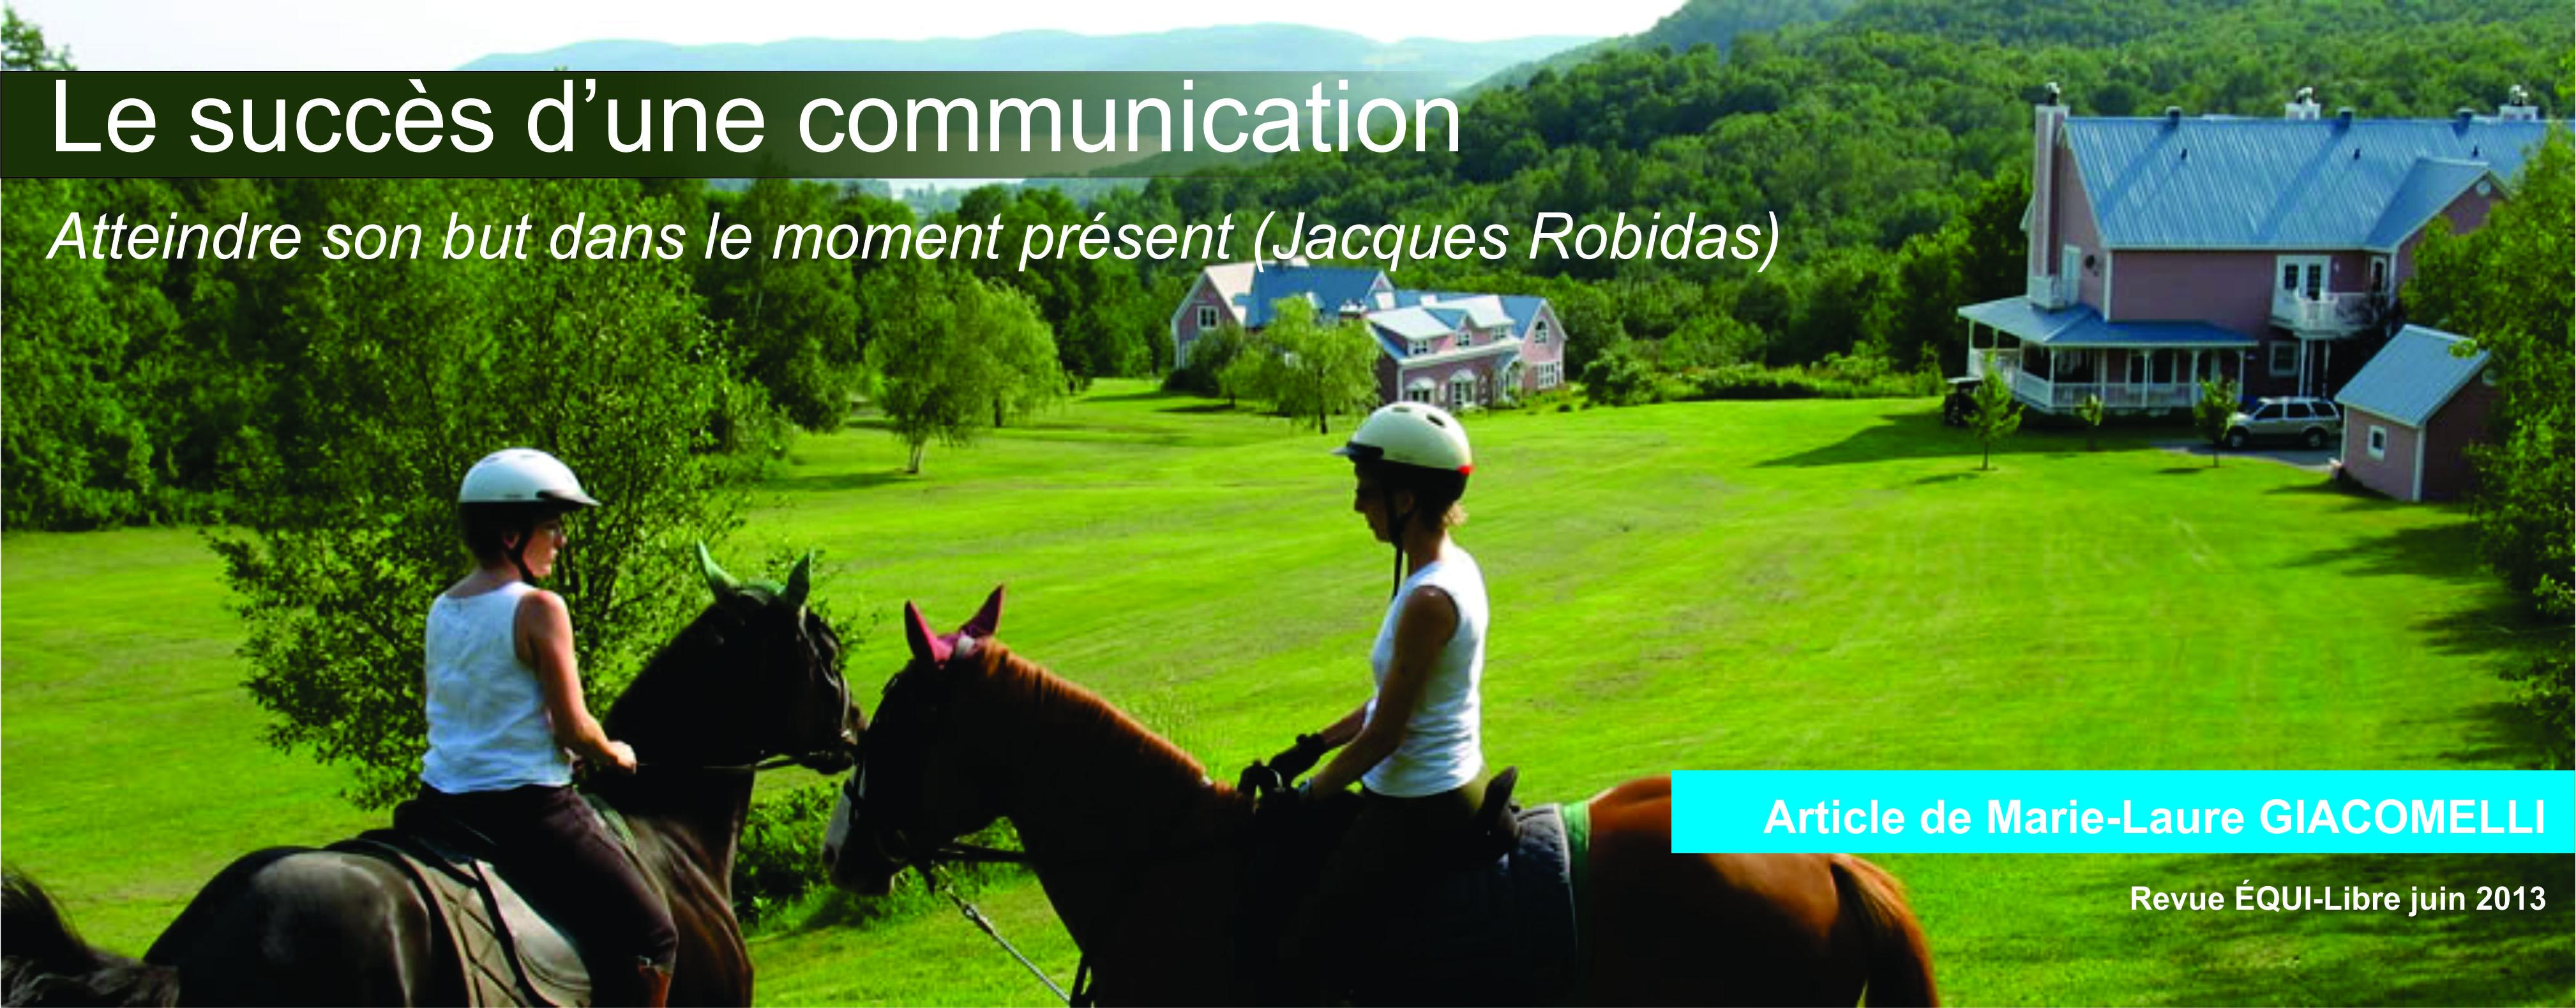 Revue Équi-Libre, juin 2013